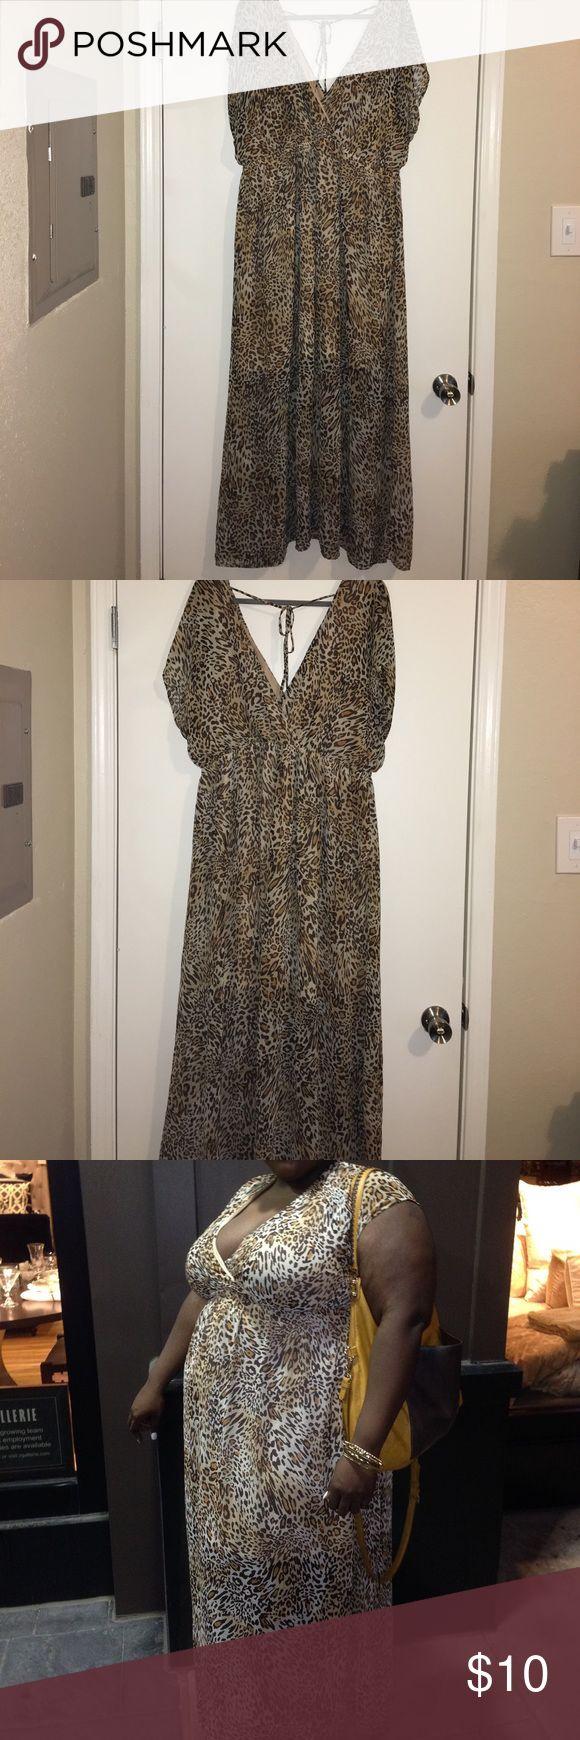 Leopard print empire waist sundress size 3X Forever 21 leopard print sundress with see through bottom. This dress has been worn. Forever 21 Dresses Maxi